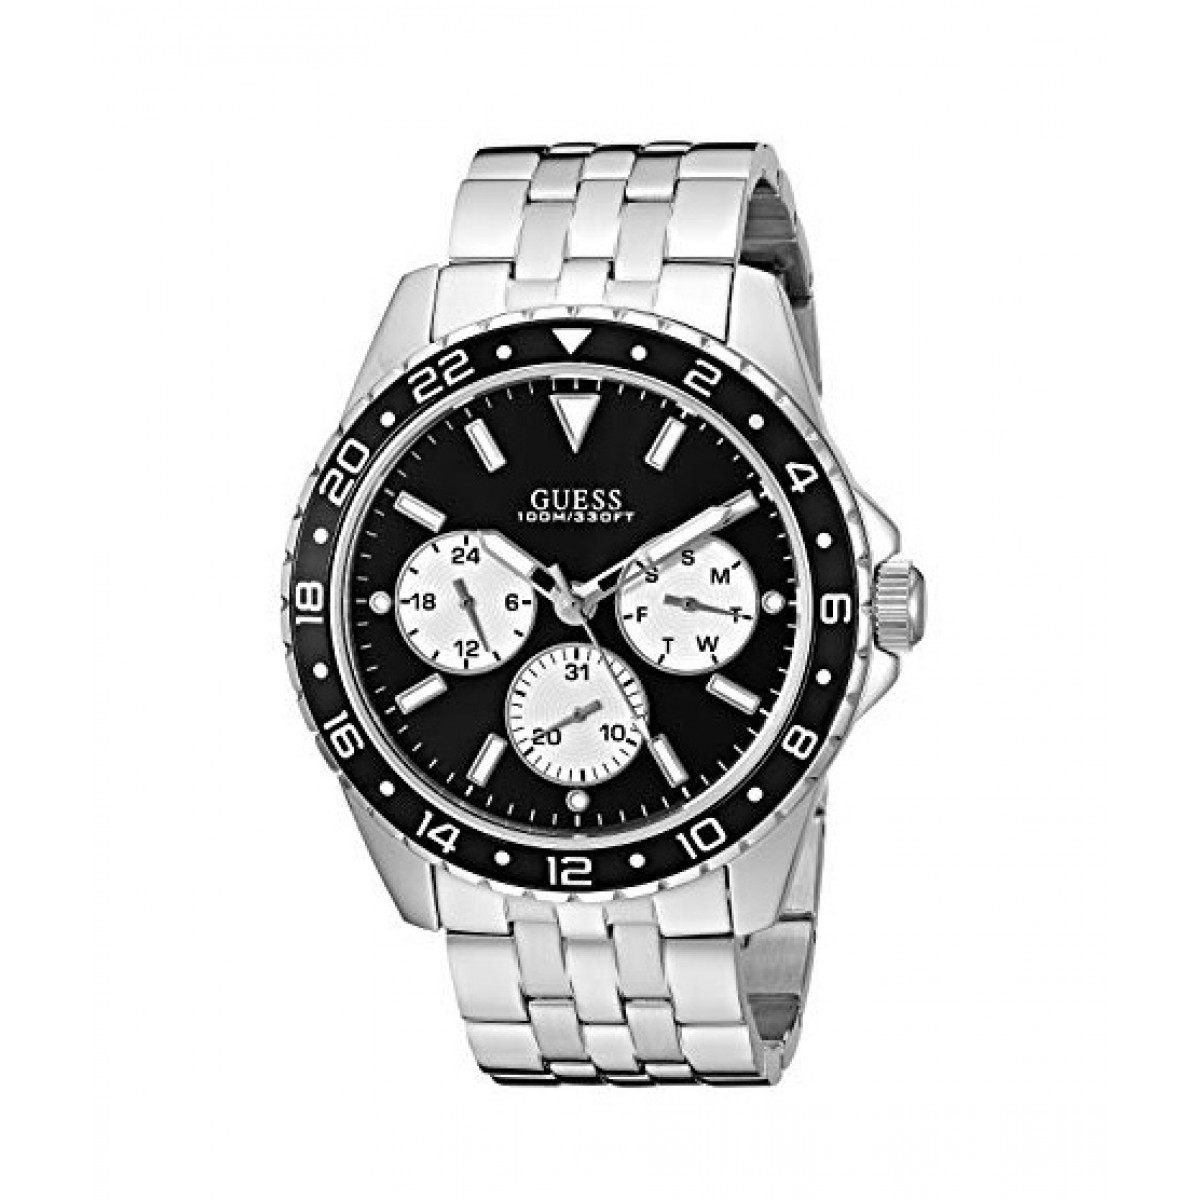 Dichiarazione Ripples Vendita  Guess Chronograph Men's Watch Price in Pakistan | Buy Guess Men's Watch  Silver-Tone (U1107G1) | iShopping.pk